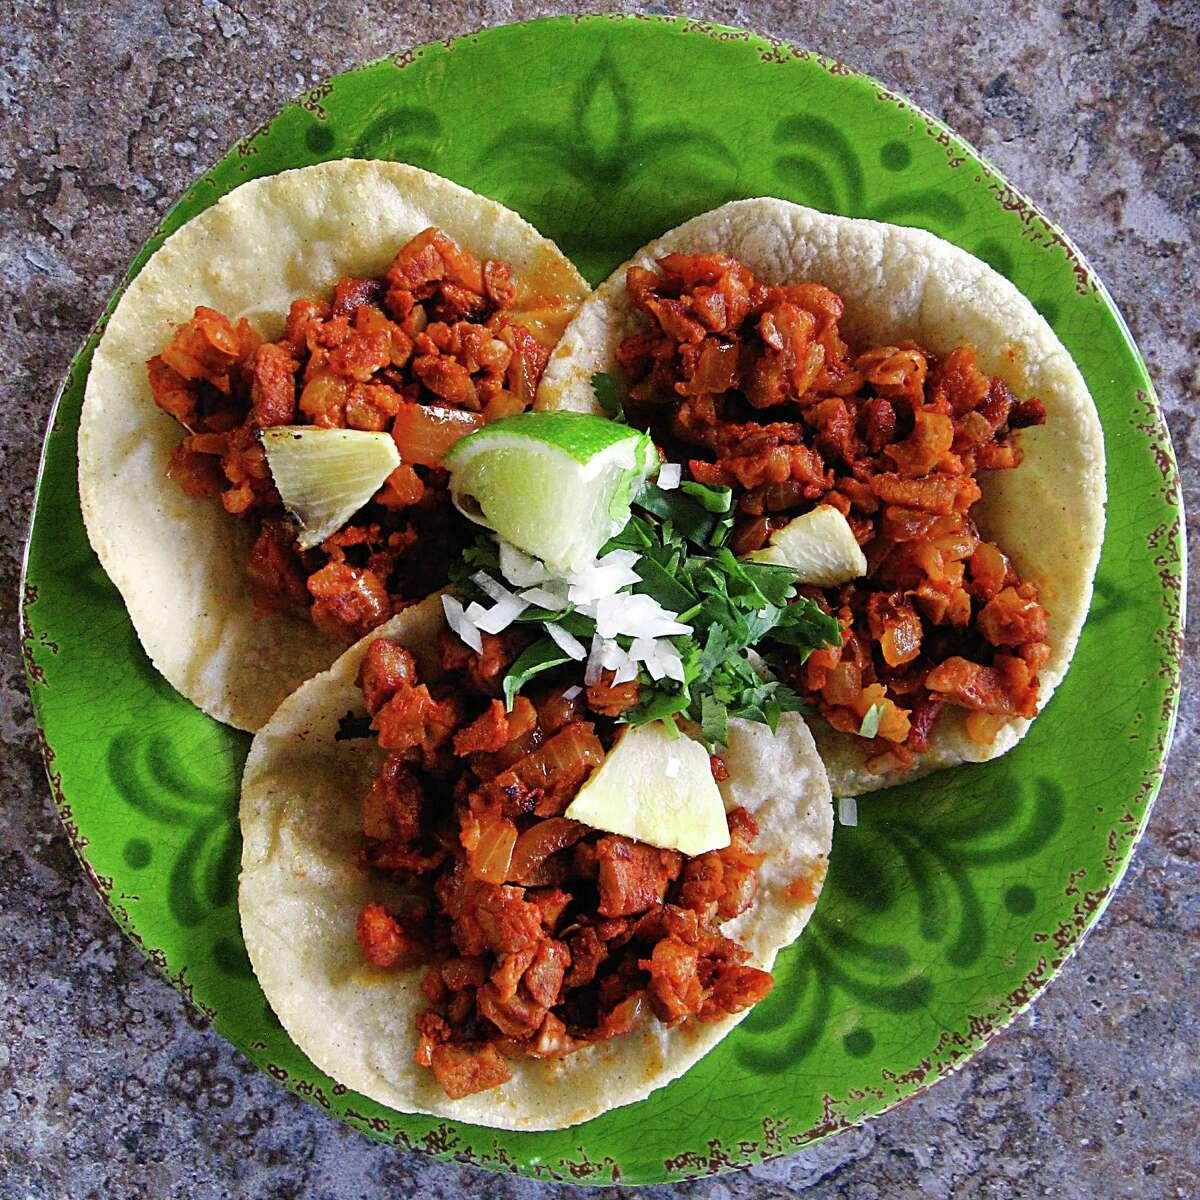 Week 6 Taco of the Week: Tacos al pastor on handmade corn tortillas from Paloma Blanca on Broadway.